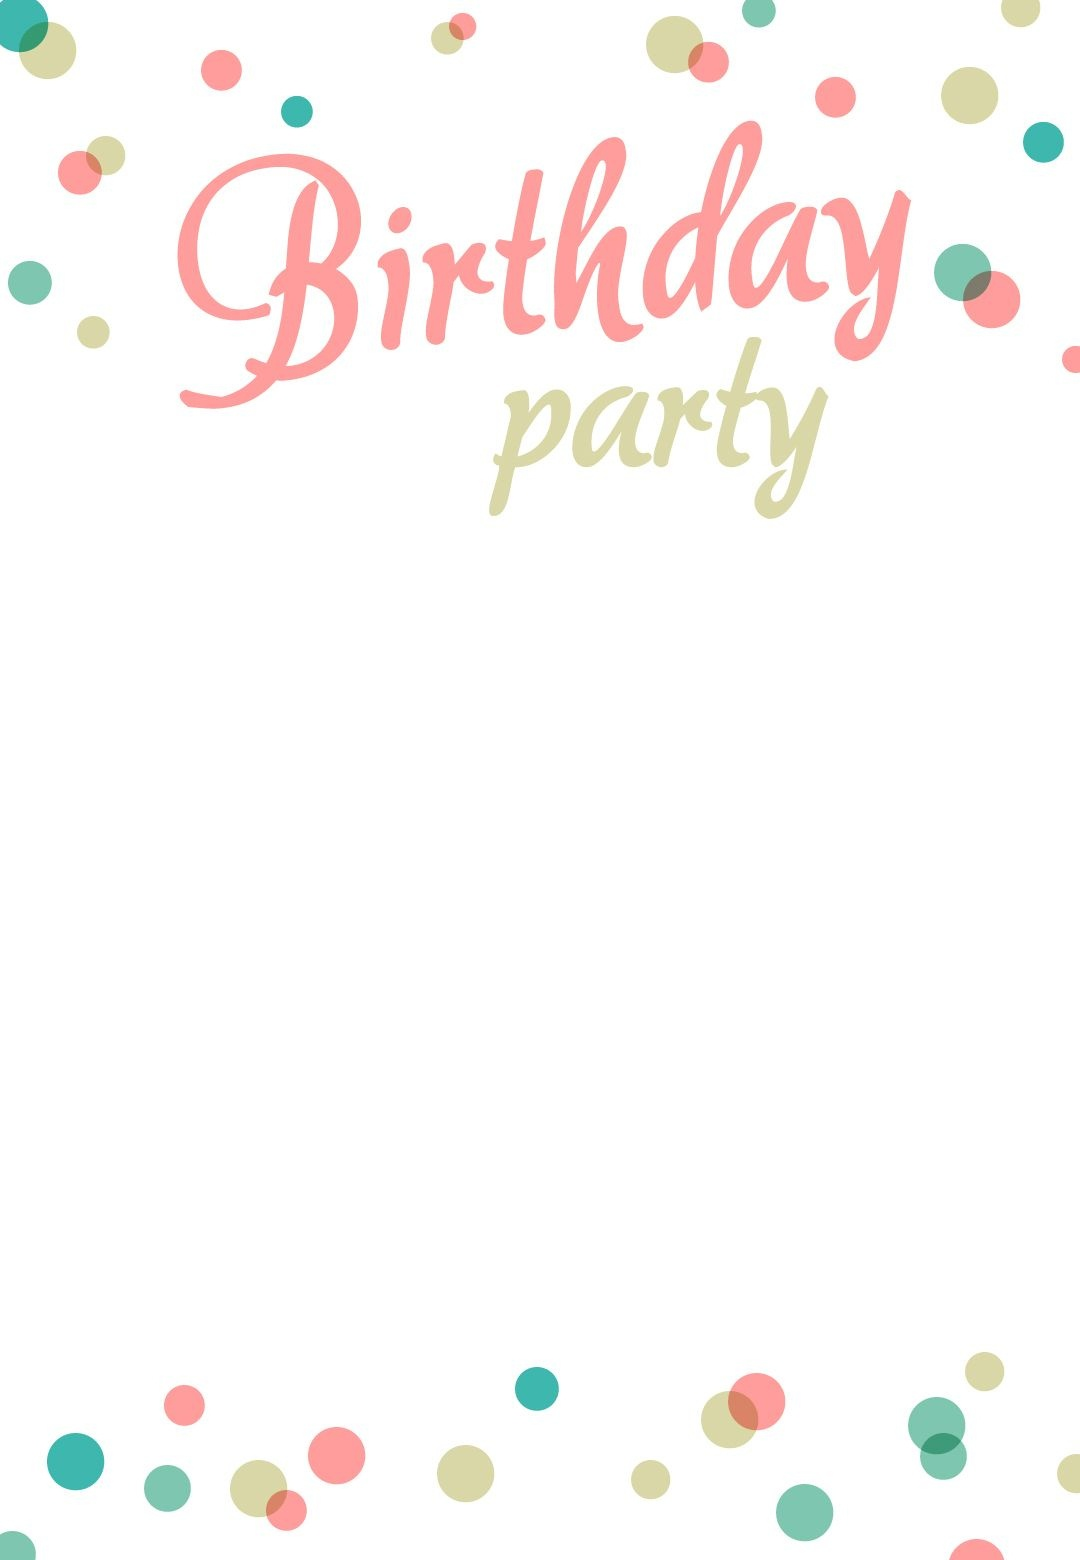 Birthday Party #invitation Free Printable | Addison's 1St Birthday - Free Printable Polka Dot Birthday Party Invitations